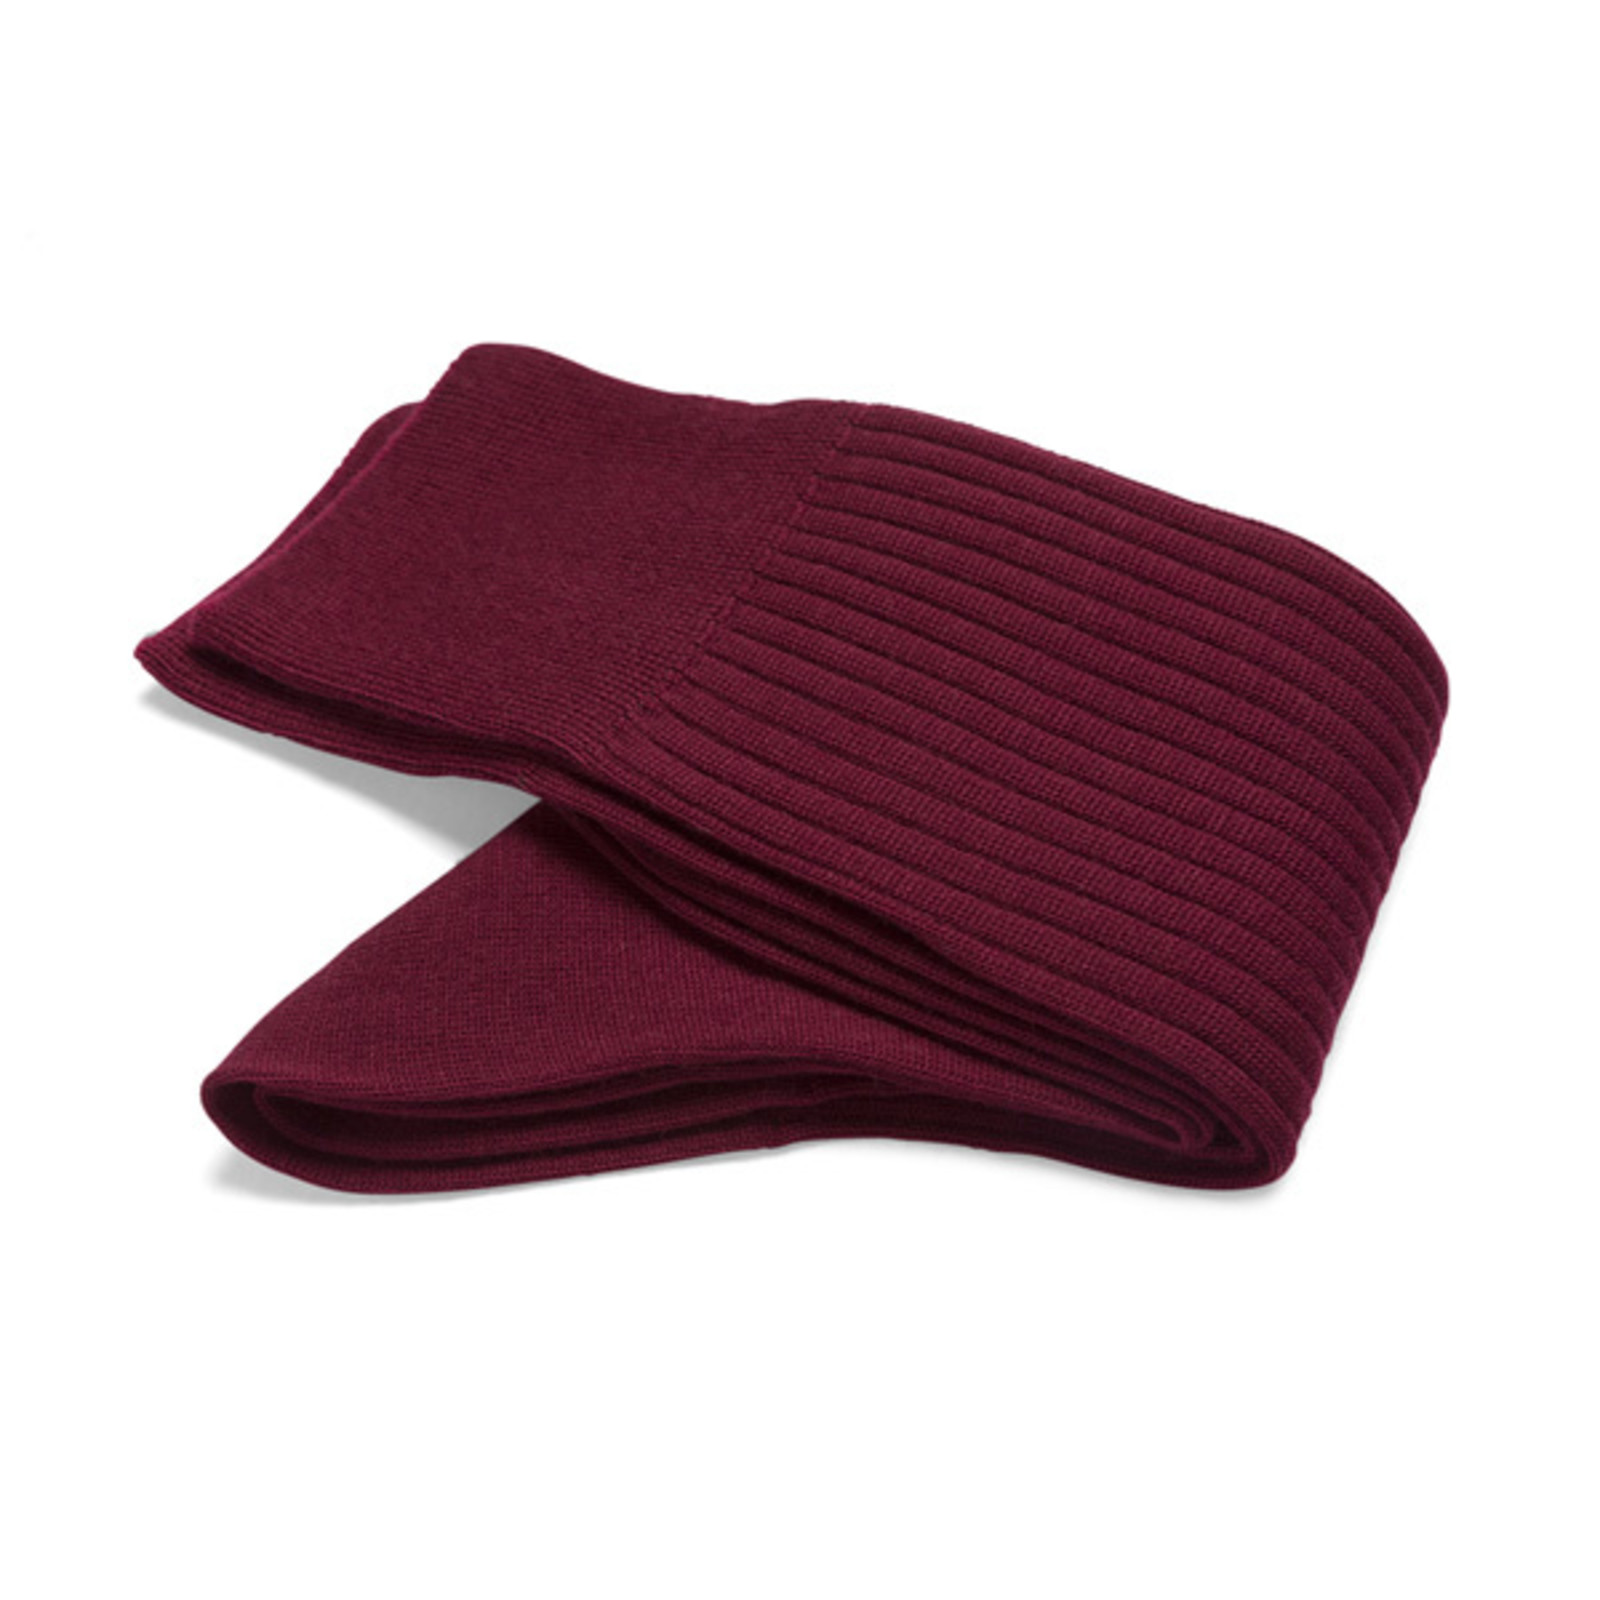 Carlo Lanza Rote Merino Wolle Socken